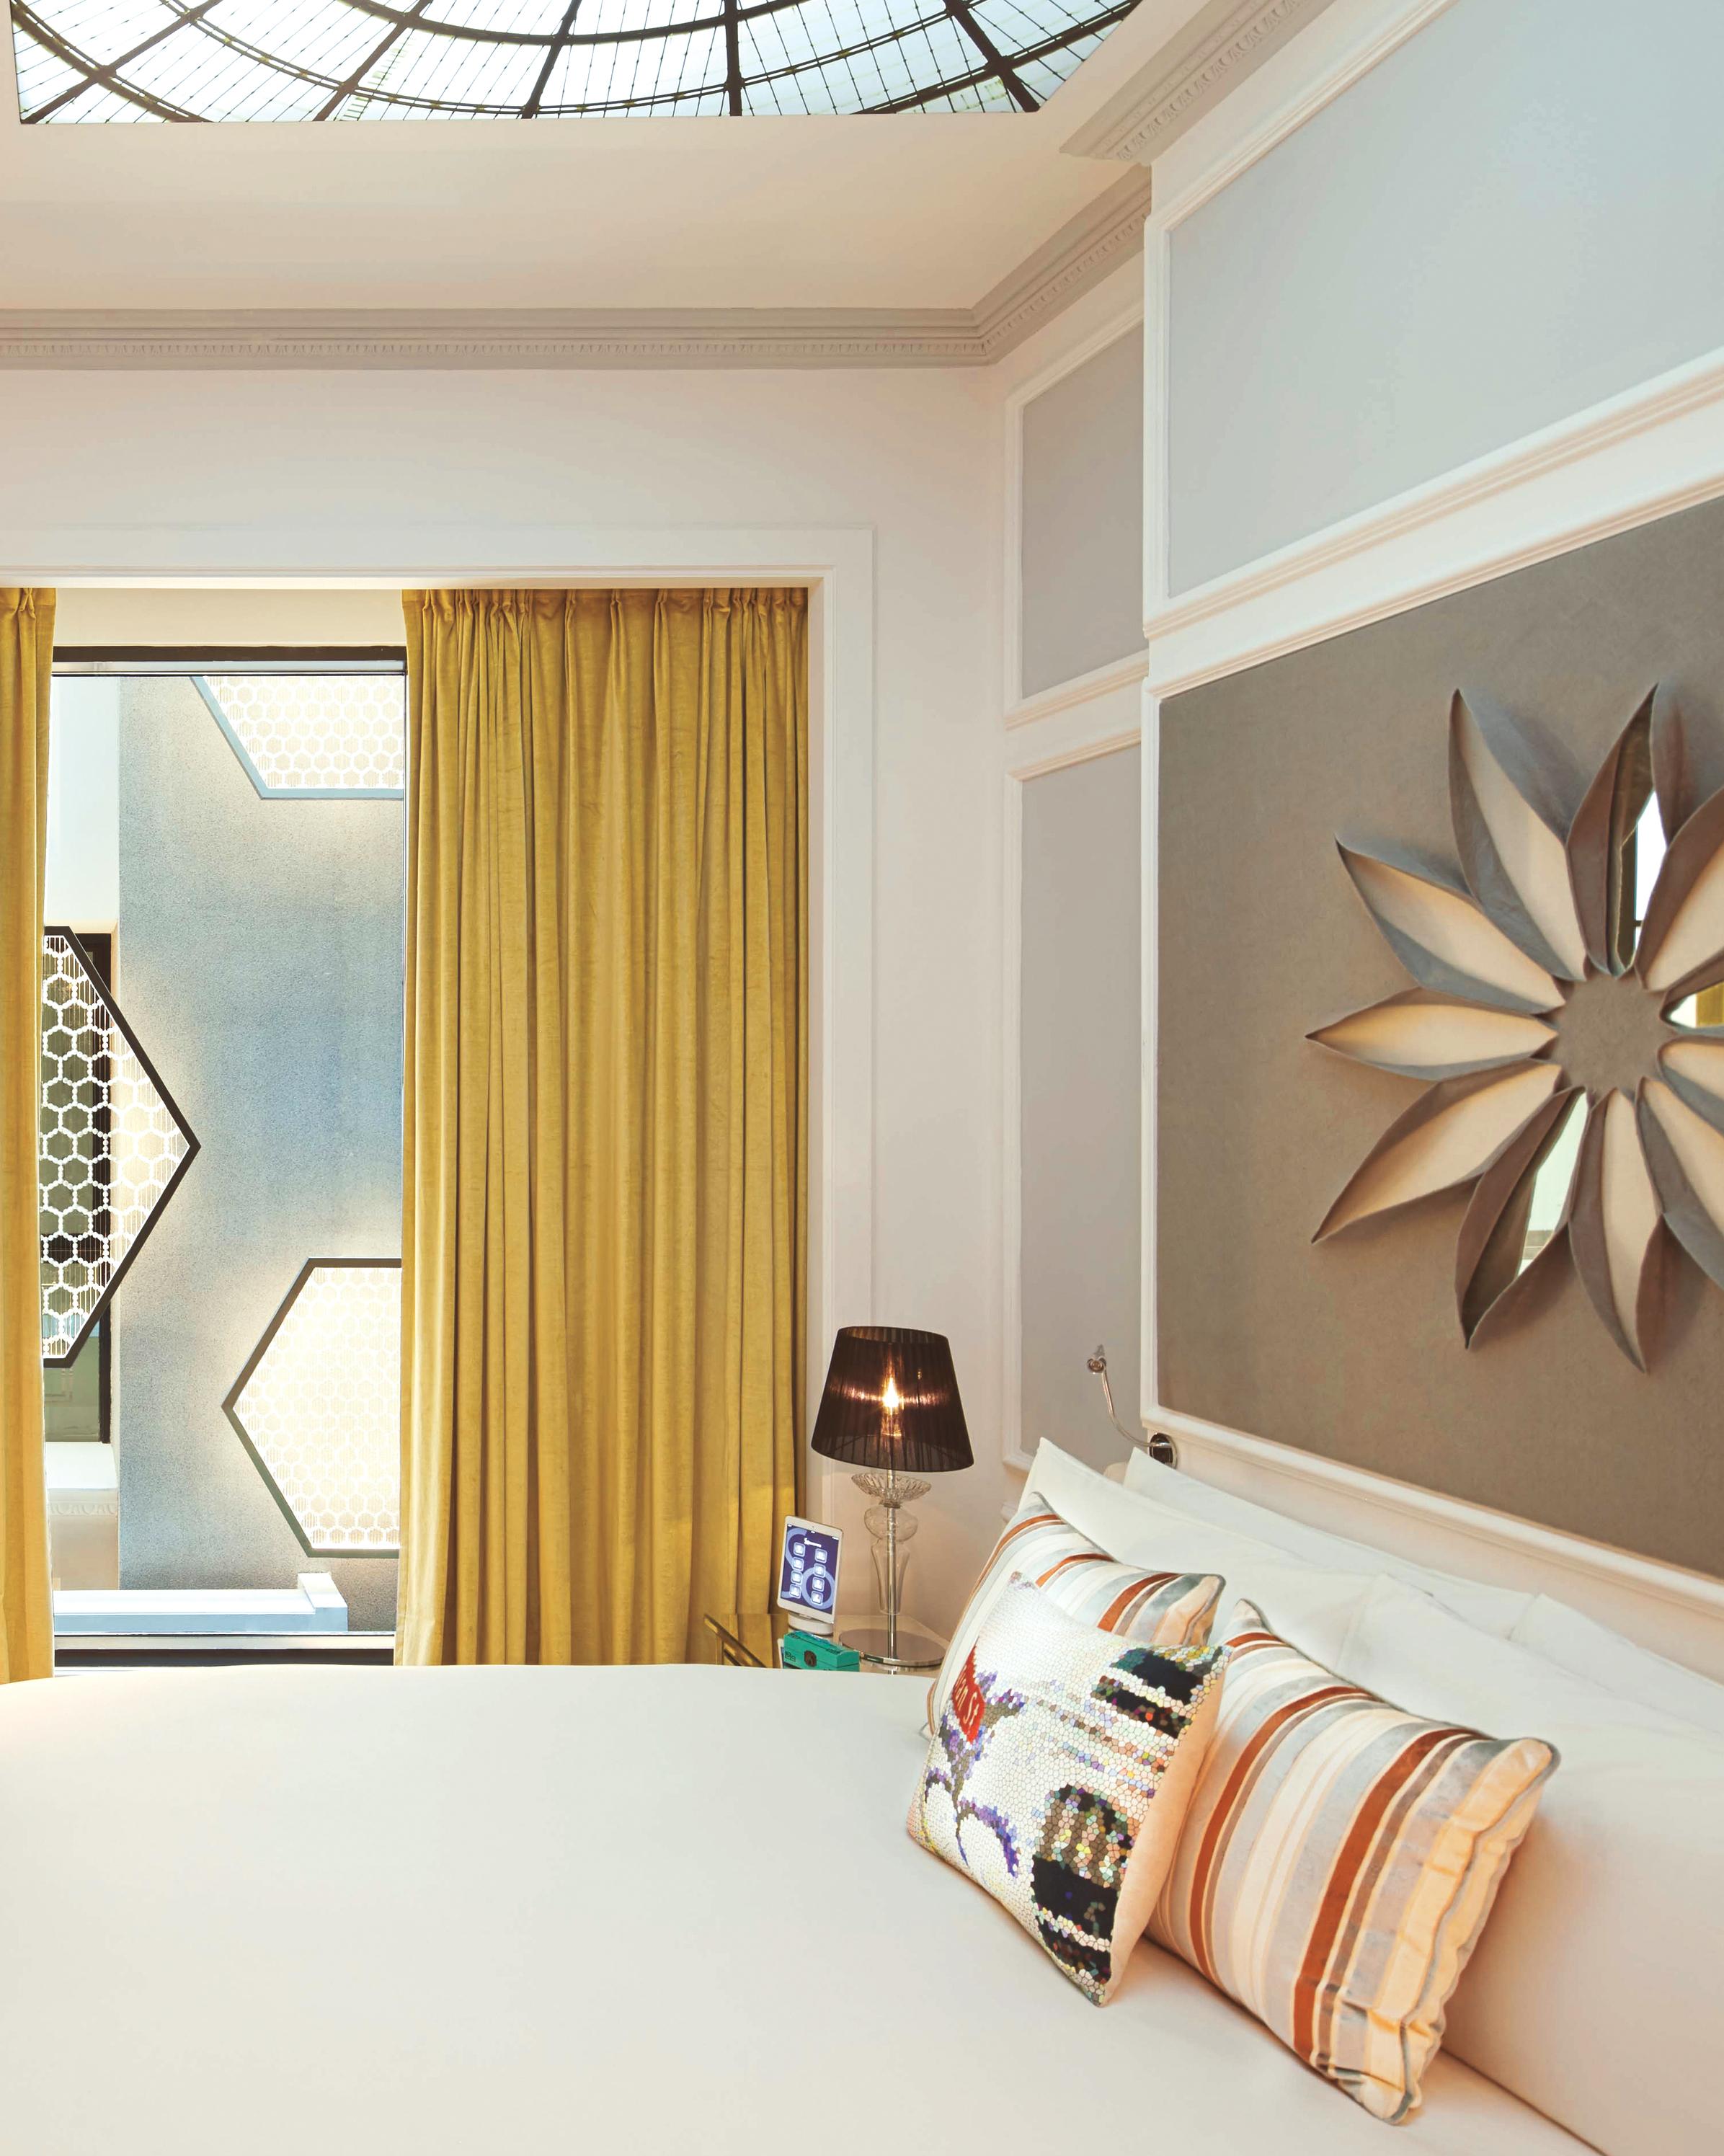 hotel-room-so-comfy-s111603.jpg